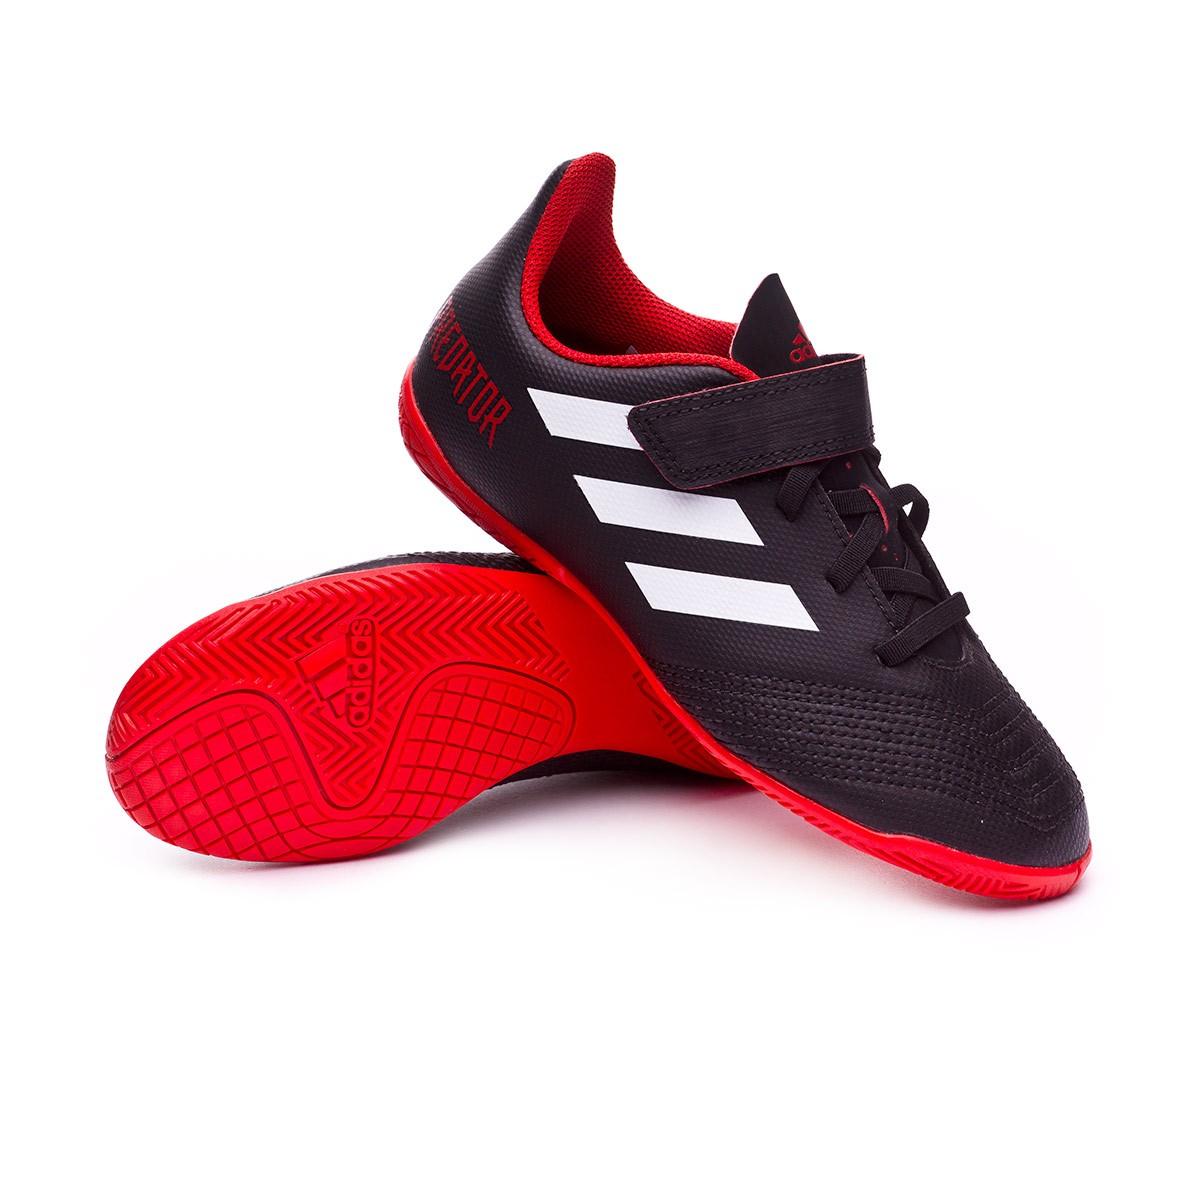 71b04117811 Futsal Boot adidas Kids Predator Tango 18.4 IN Core black-White-Red ...